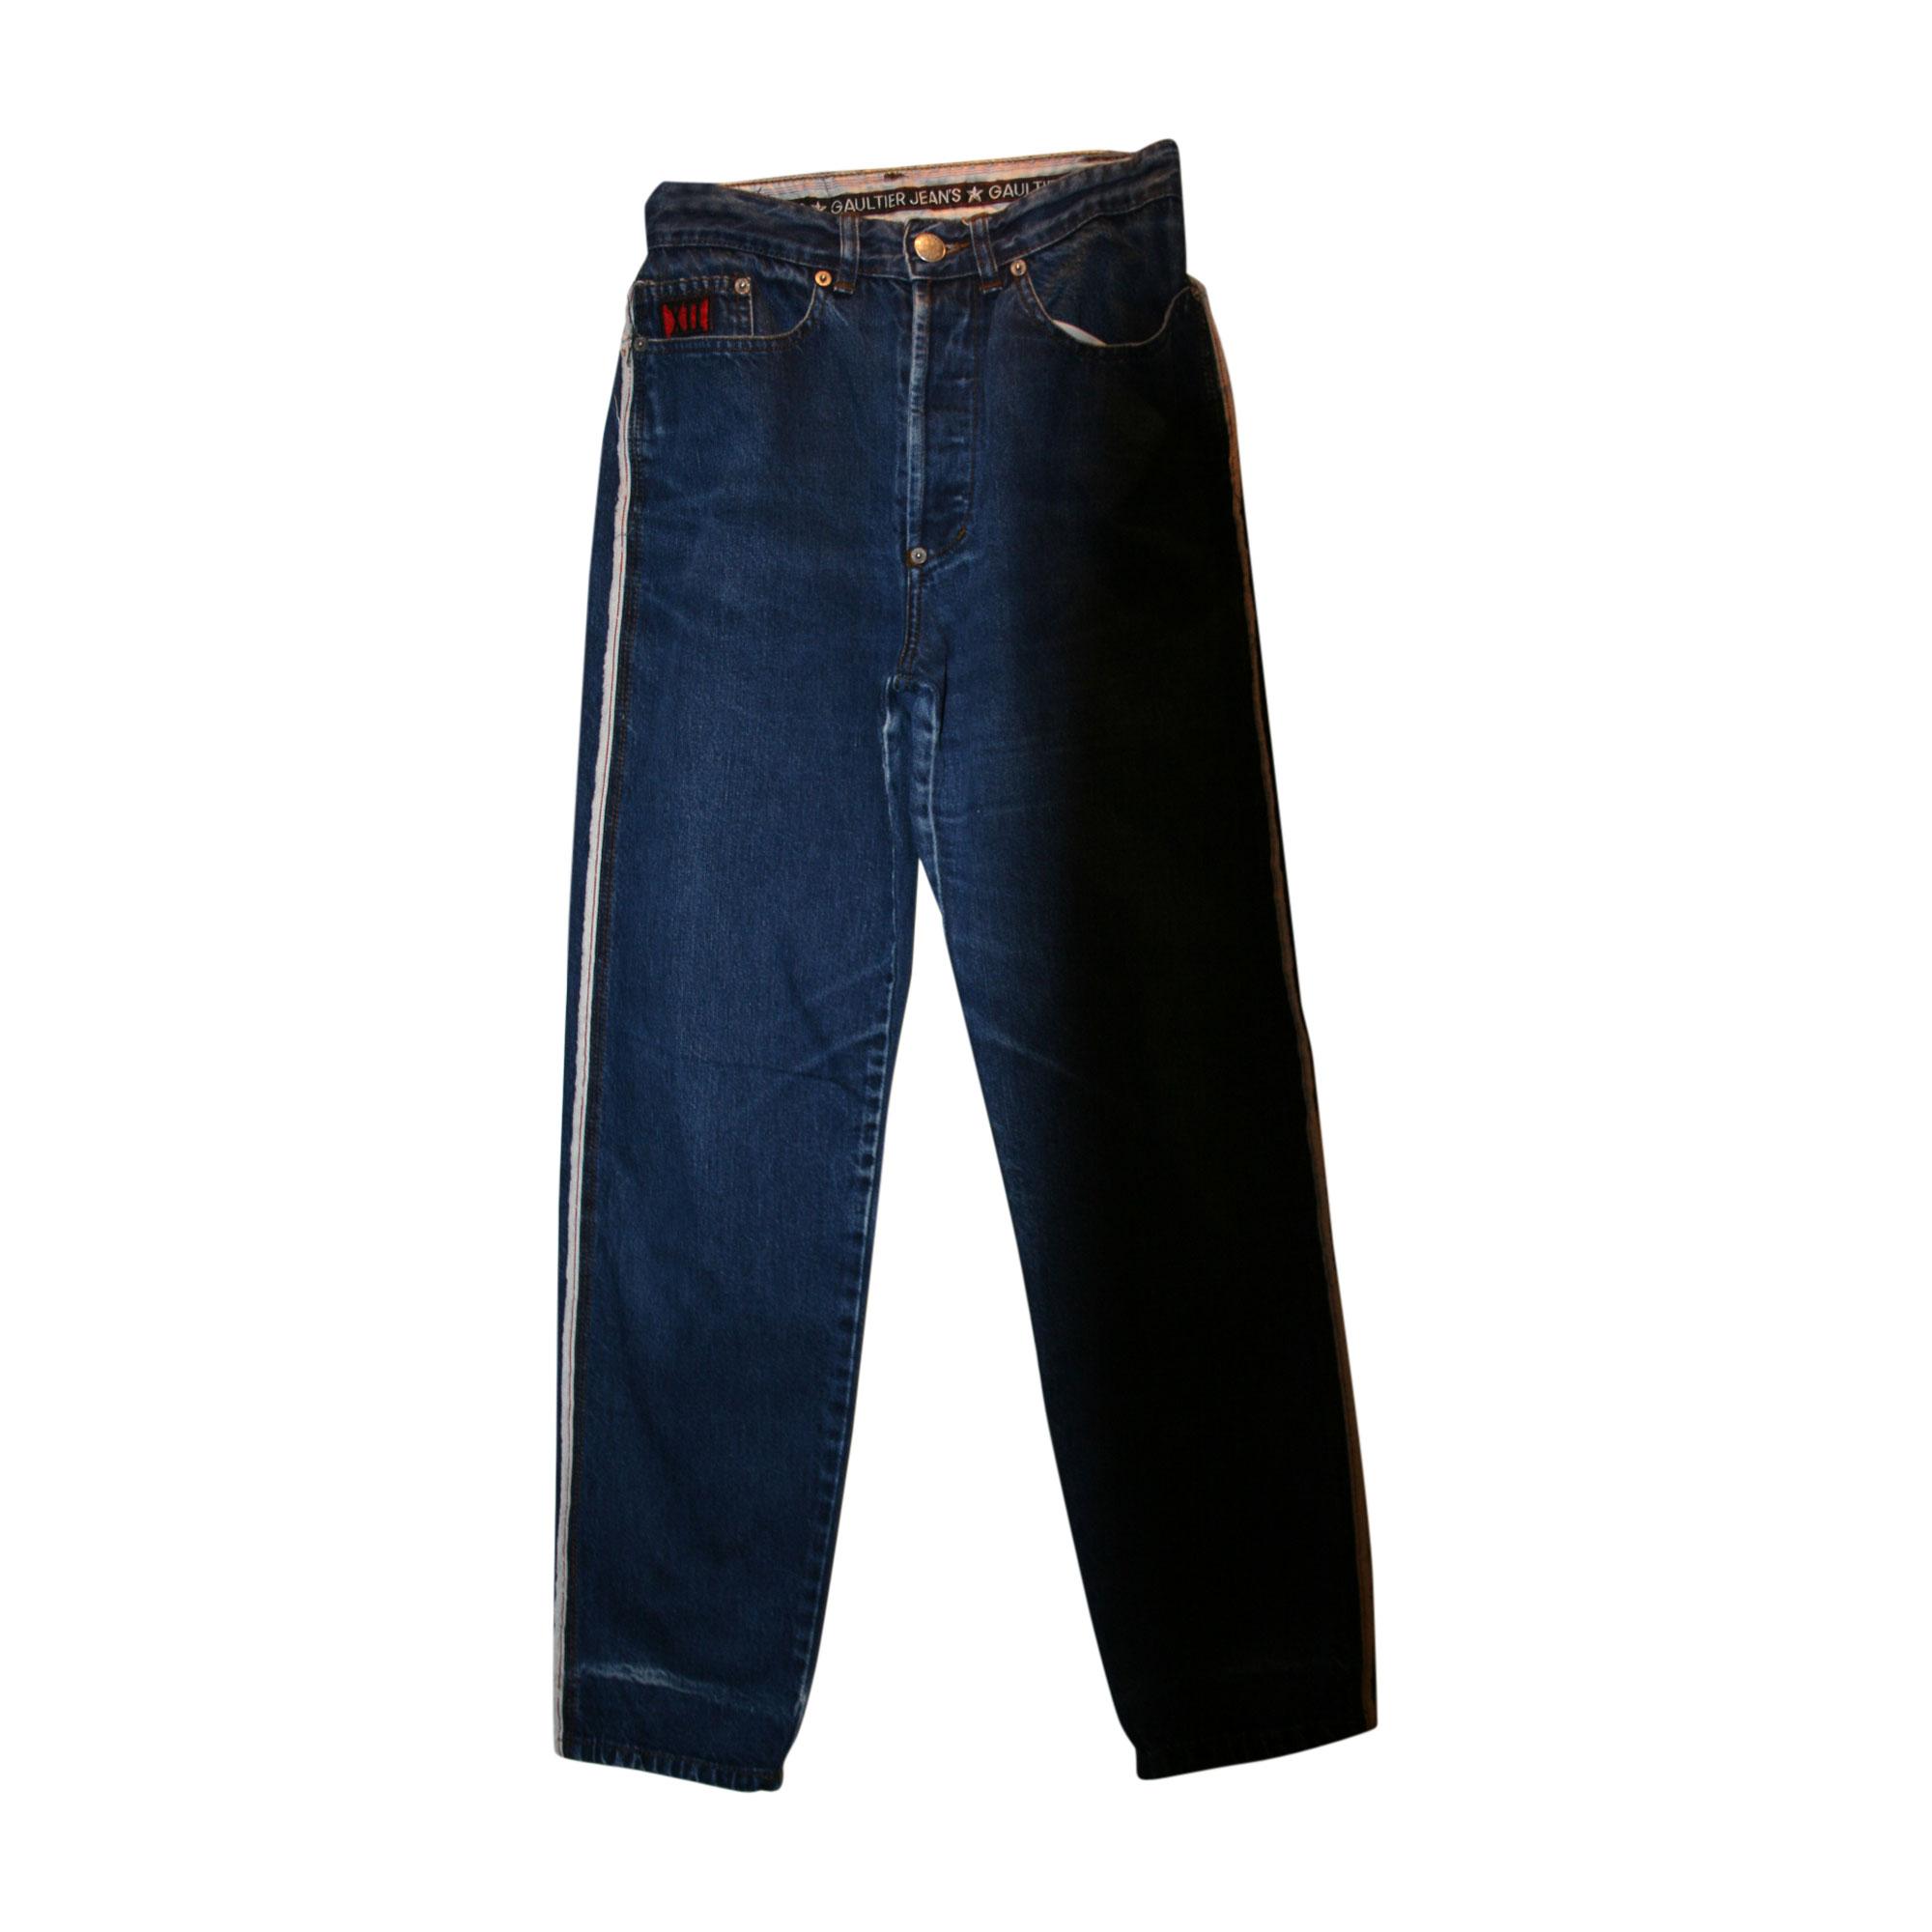 Pantalon droit JEAN PAUL GAULTIER Bleu, bleu marine, bleu turquoise